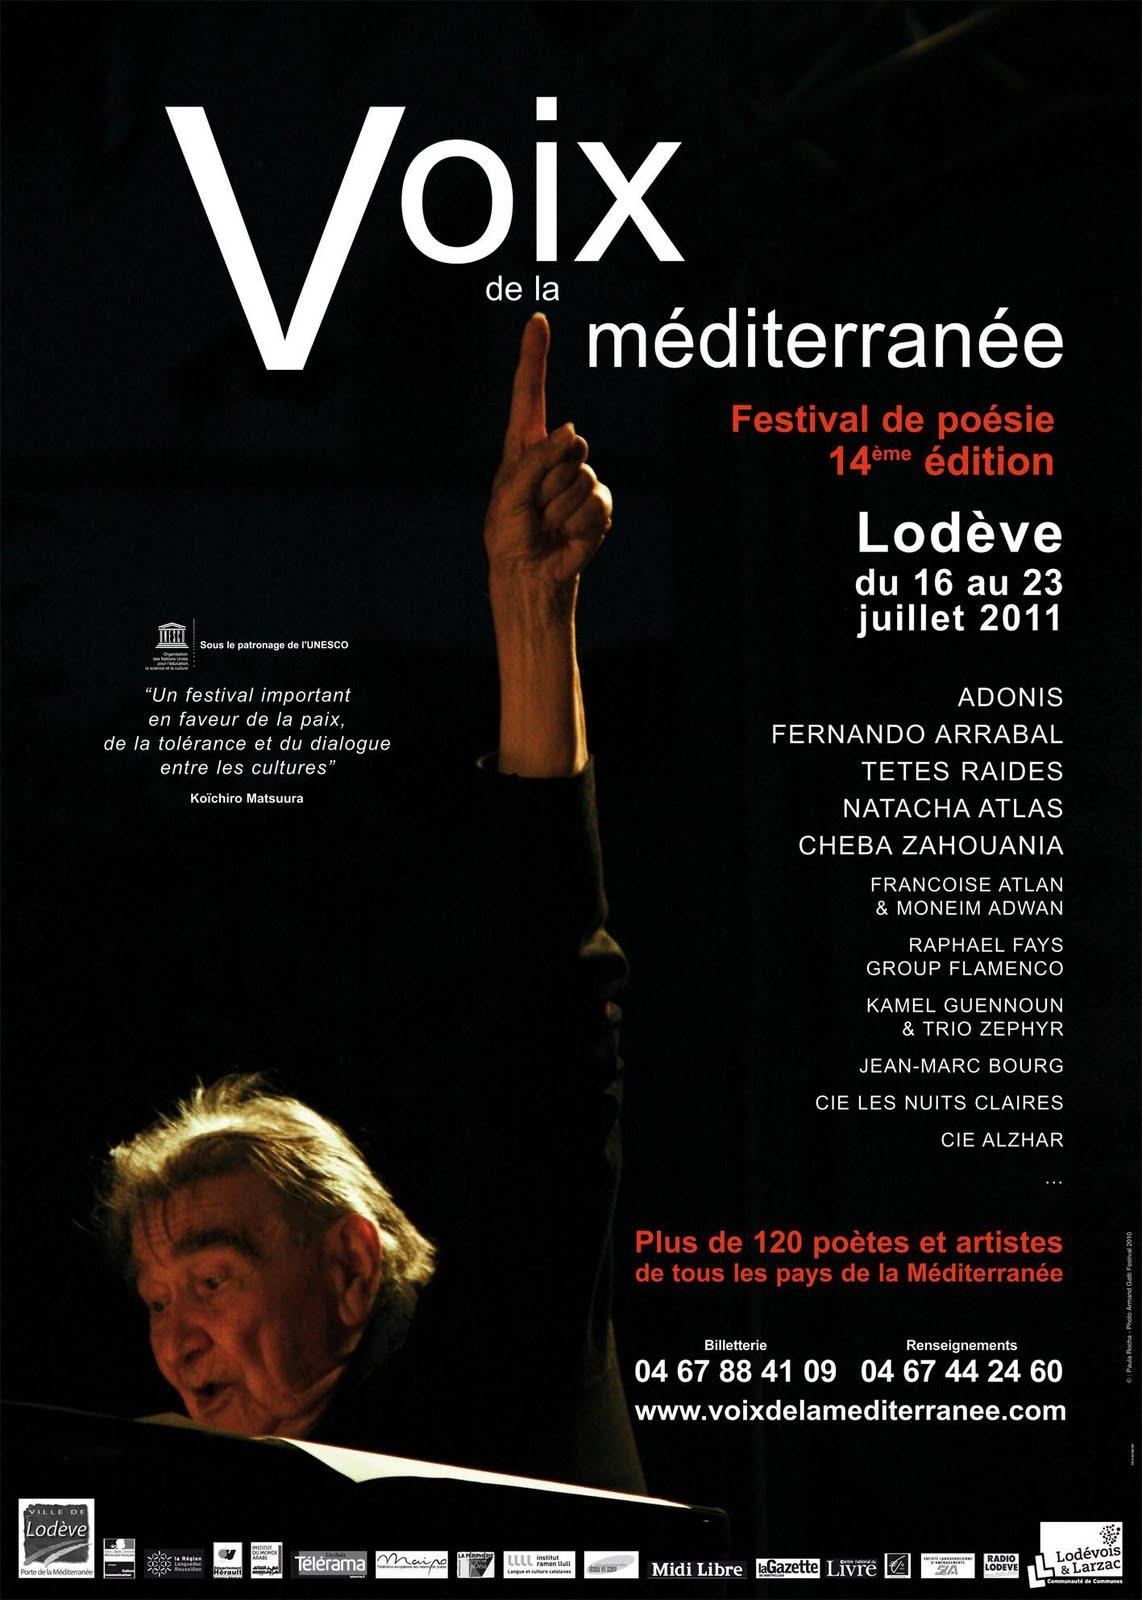 les-voix-de-la-mediterranee-lodeve2011